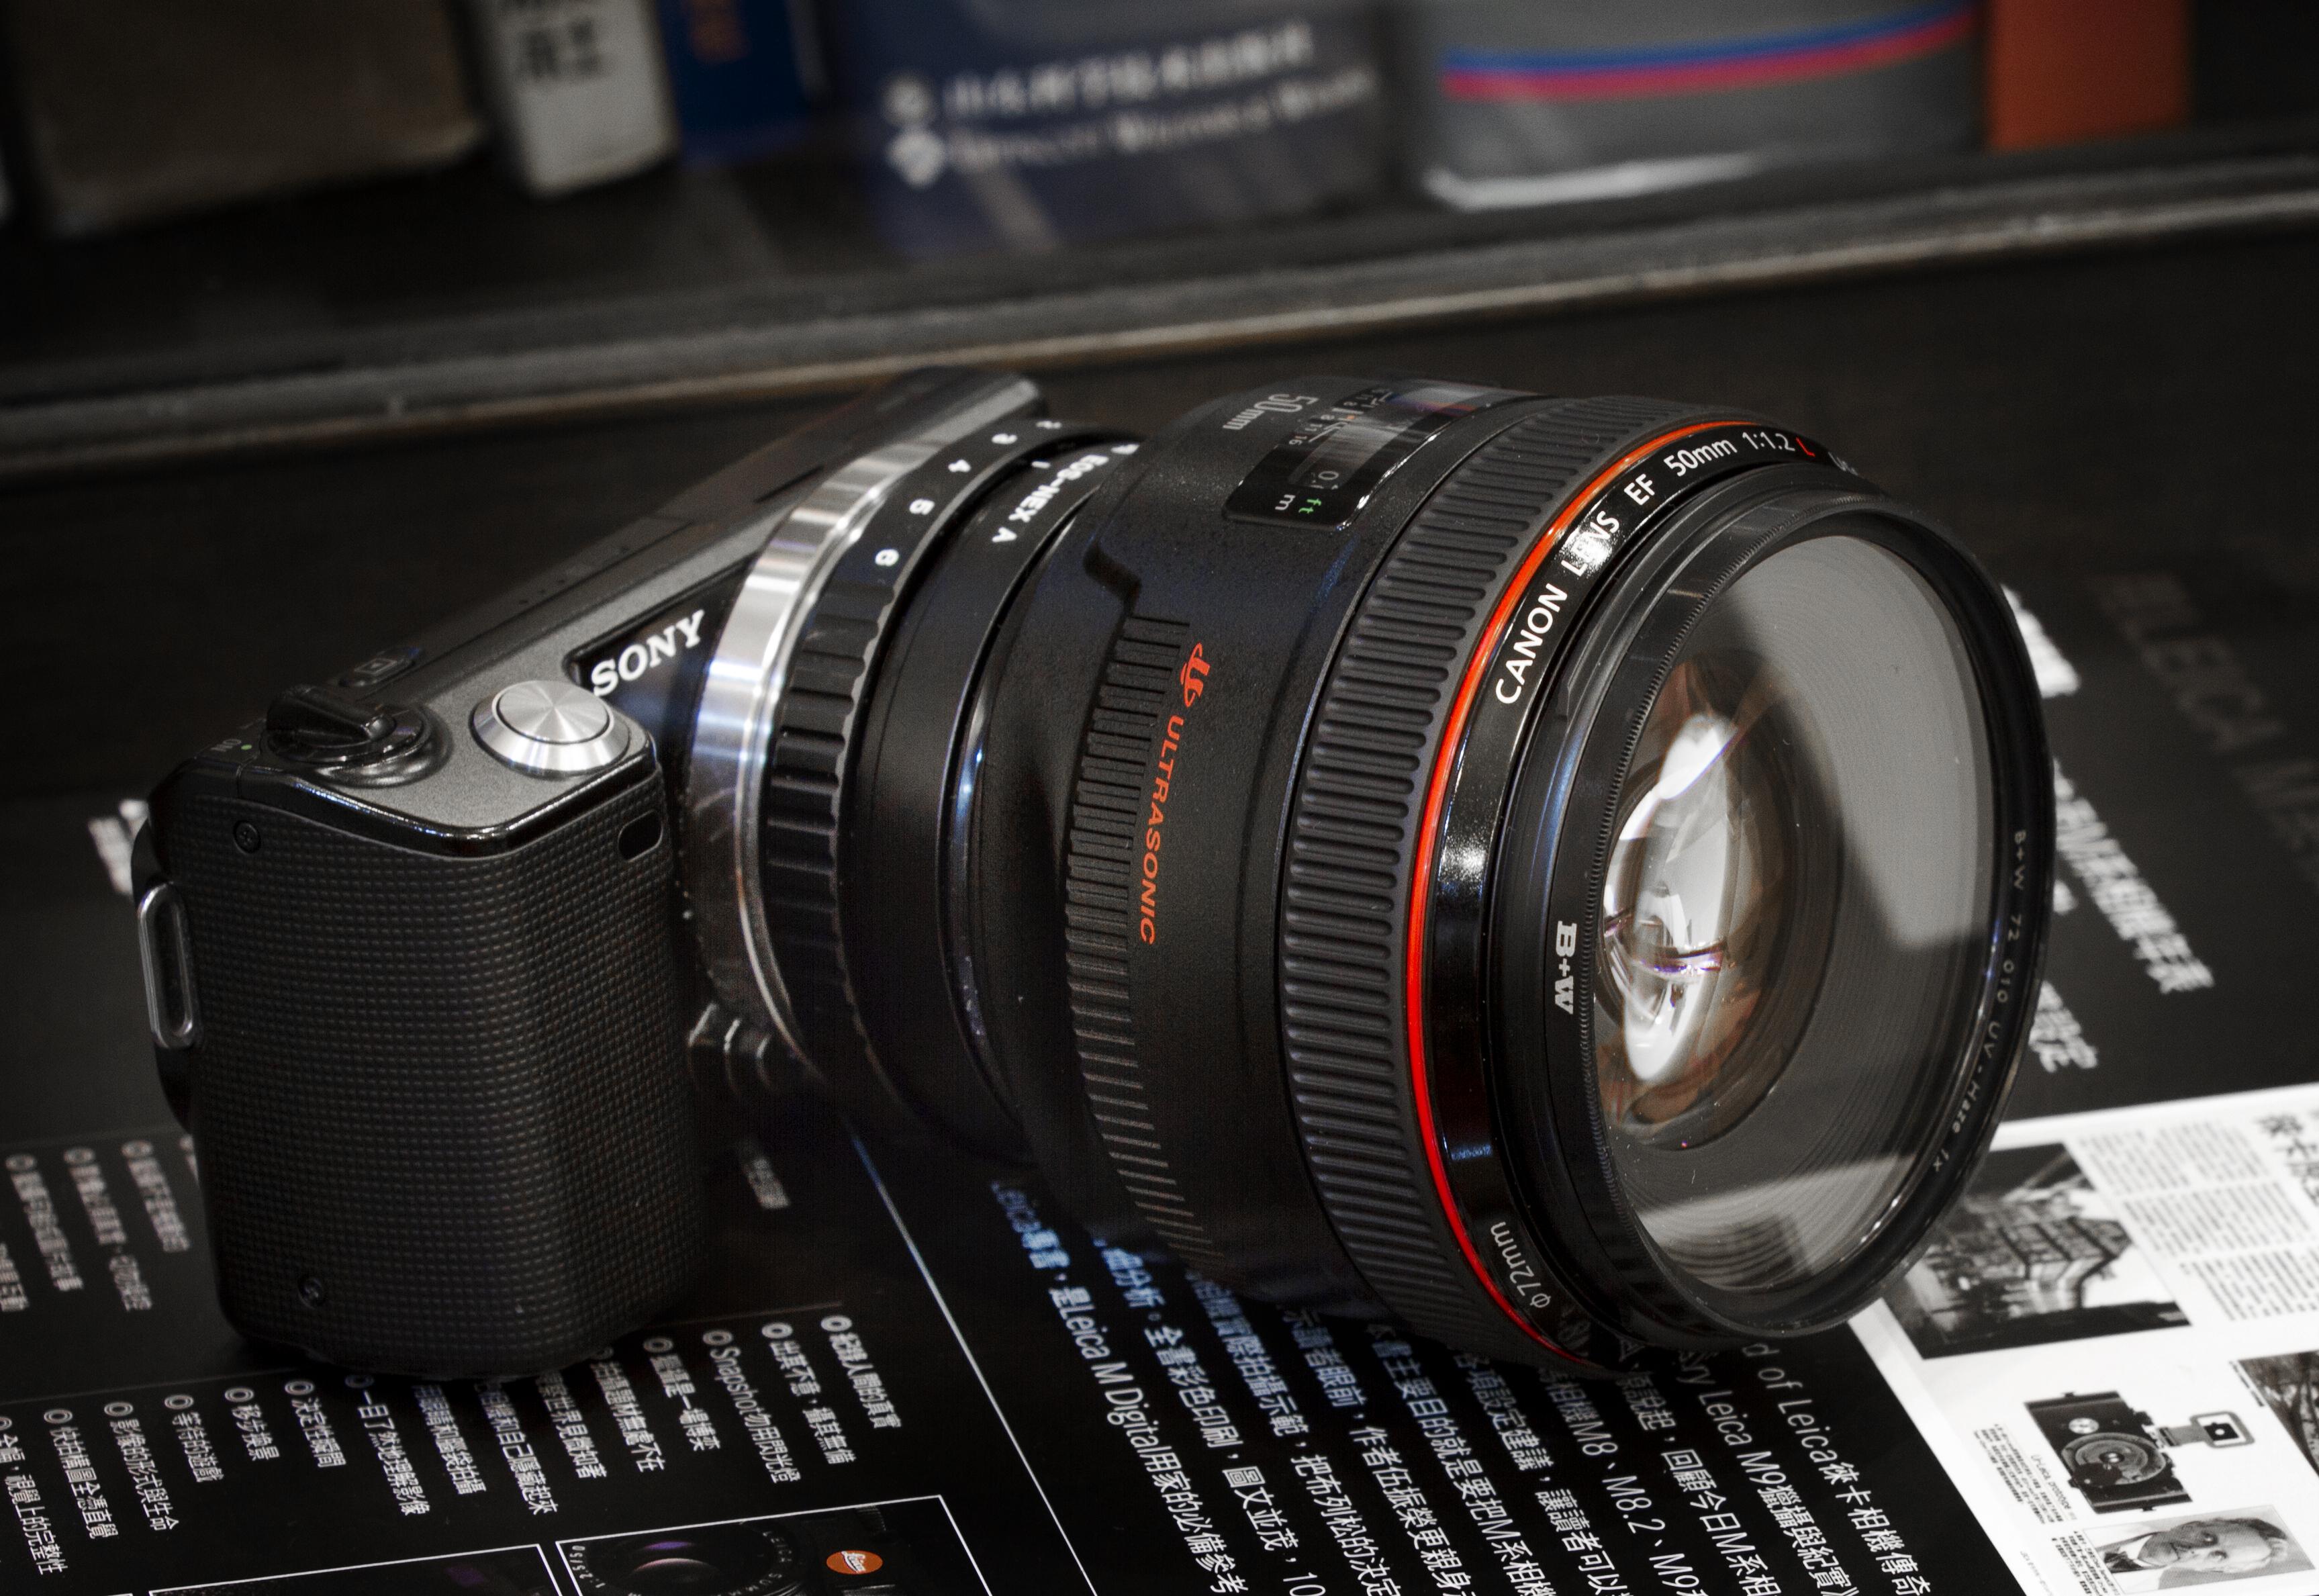 File:Canon 50mm f1.2 L on Nex-5c.jpg - Wikimedia Commons